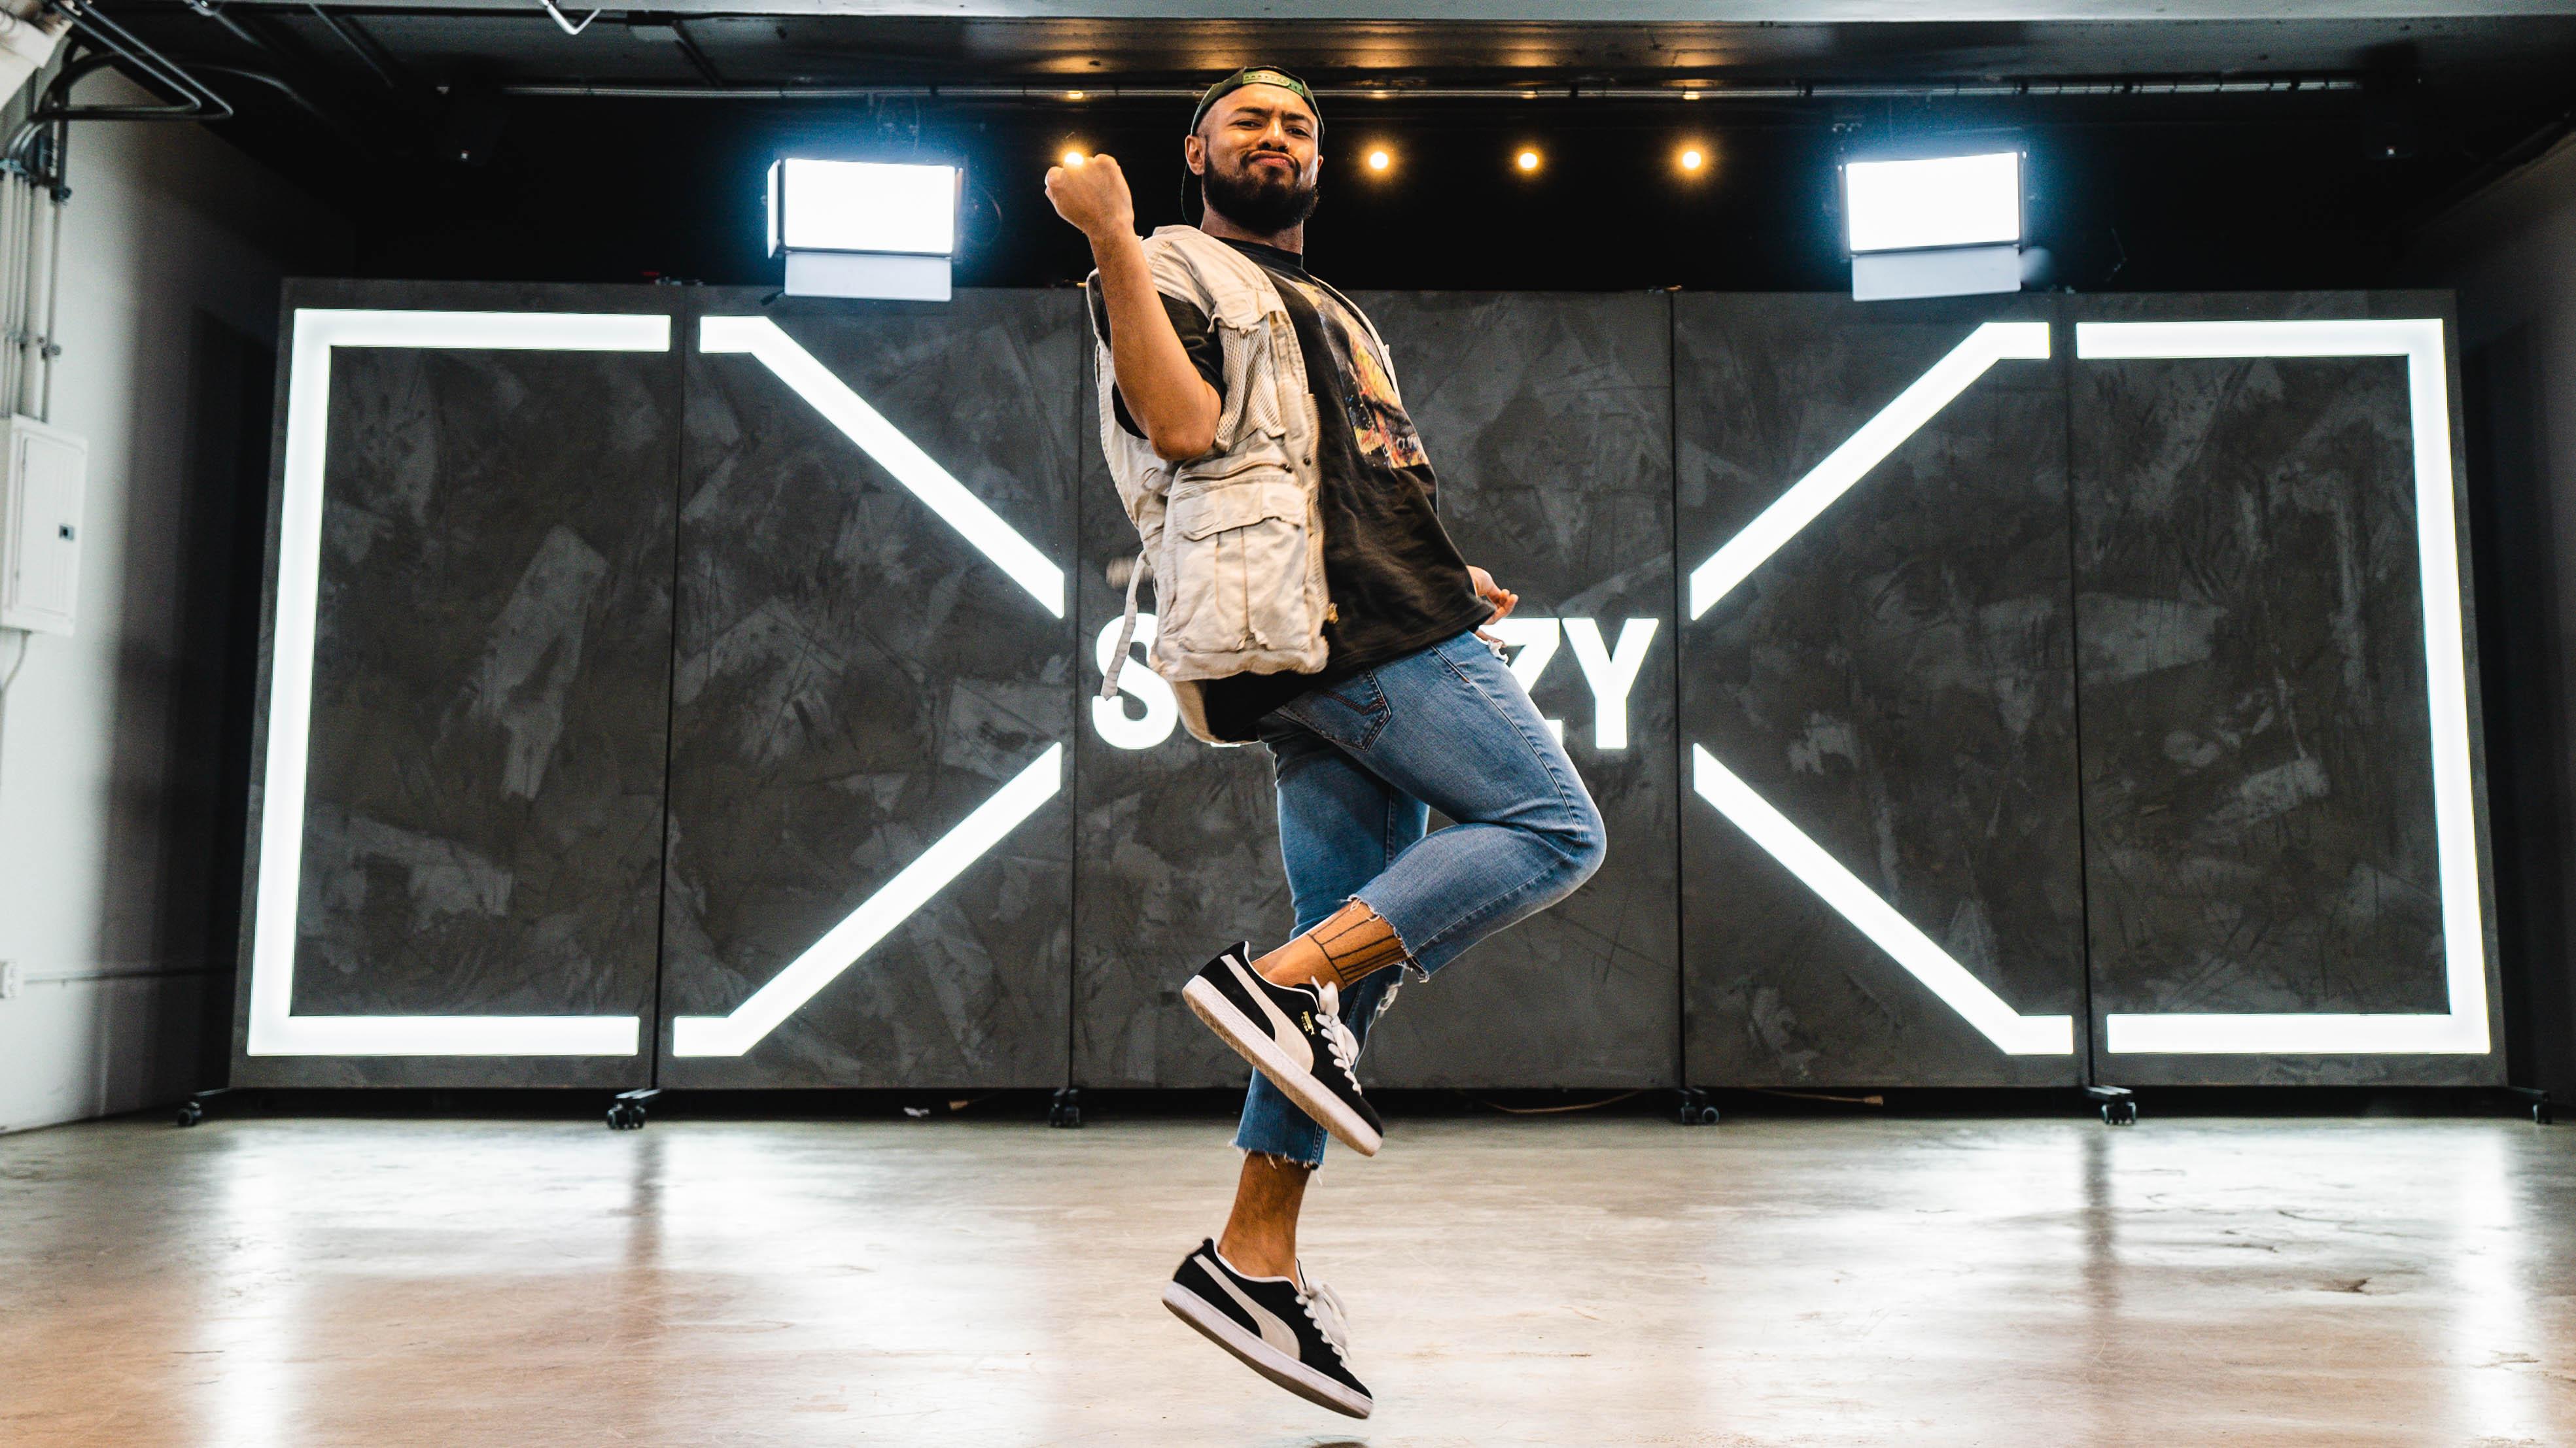 Brandon Beastboi Juezan doing the shoot dance move